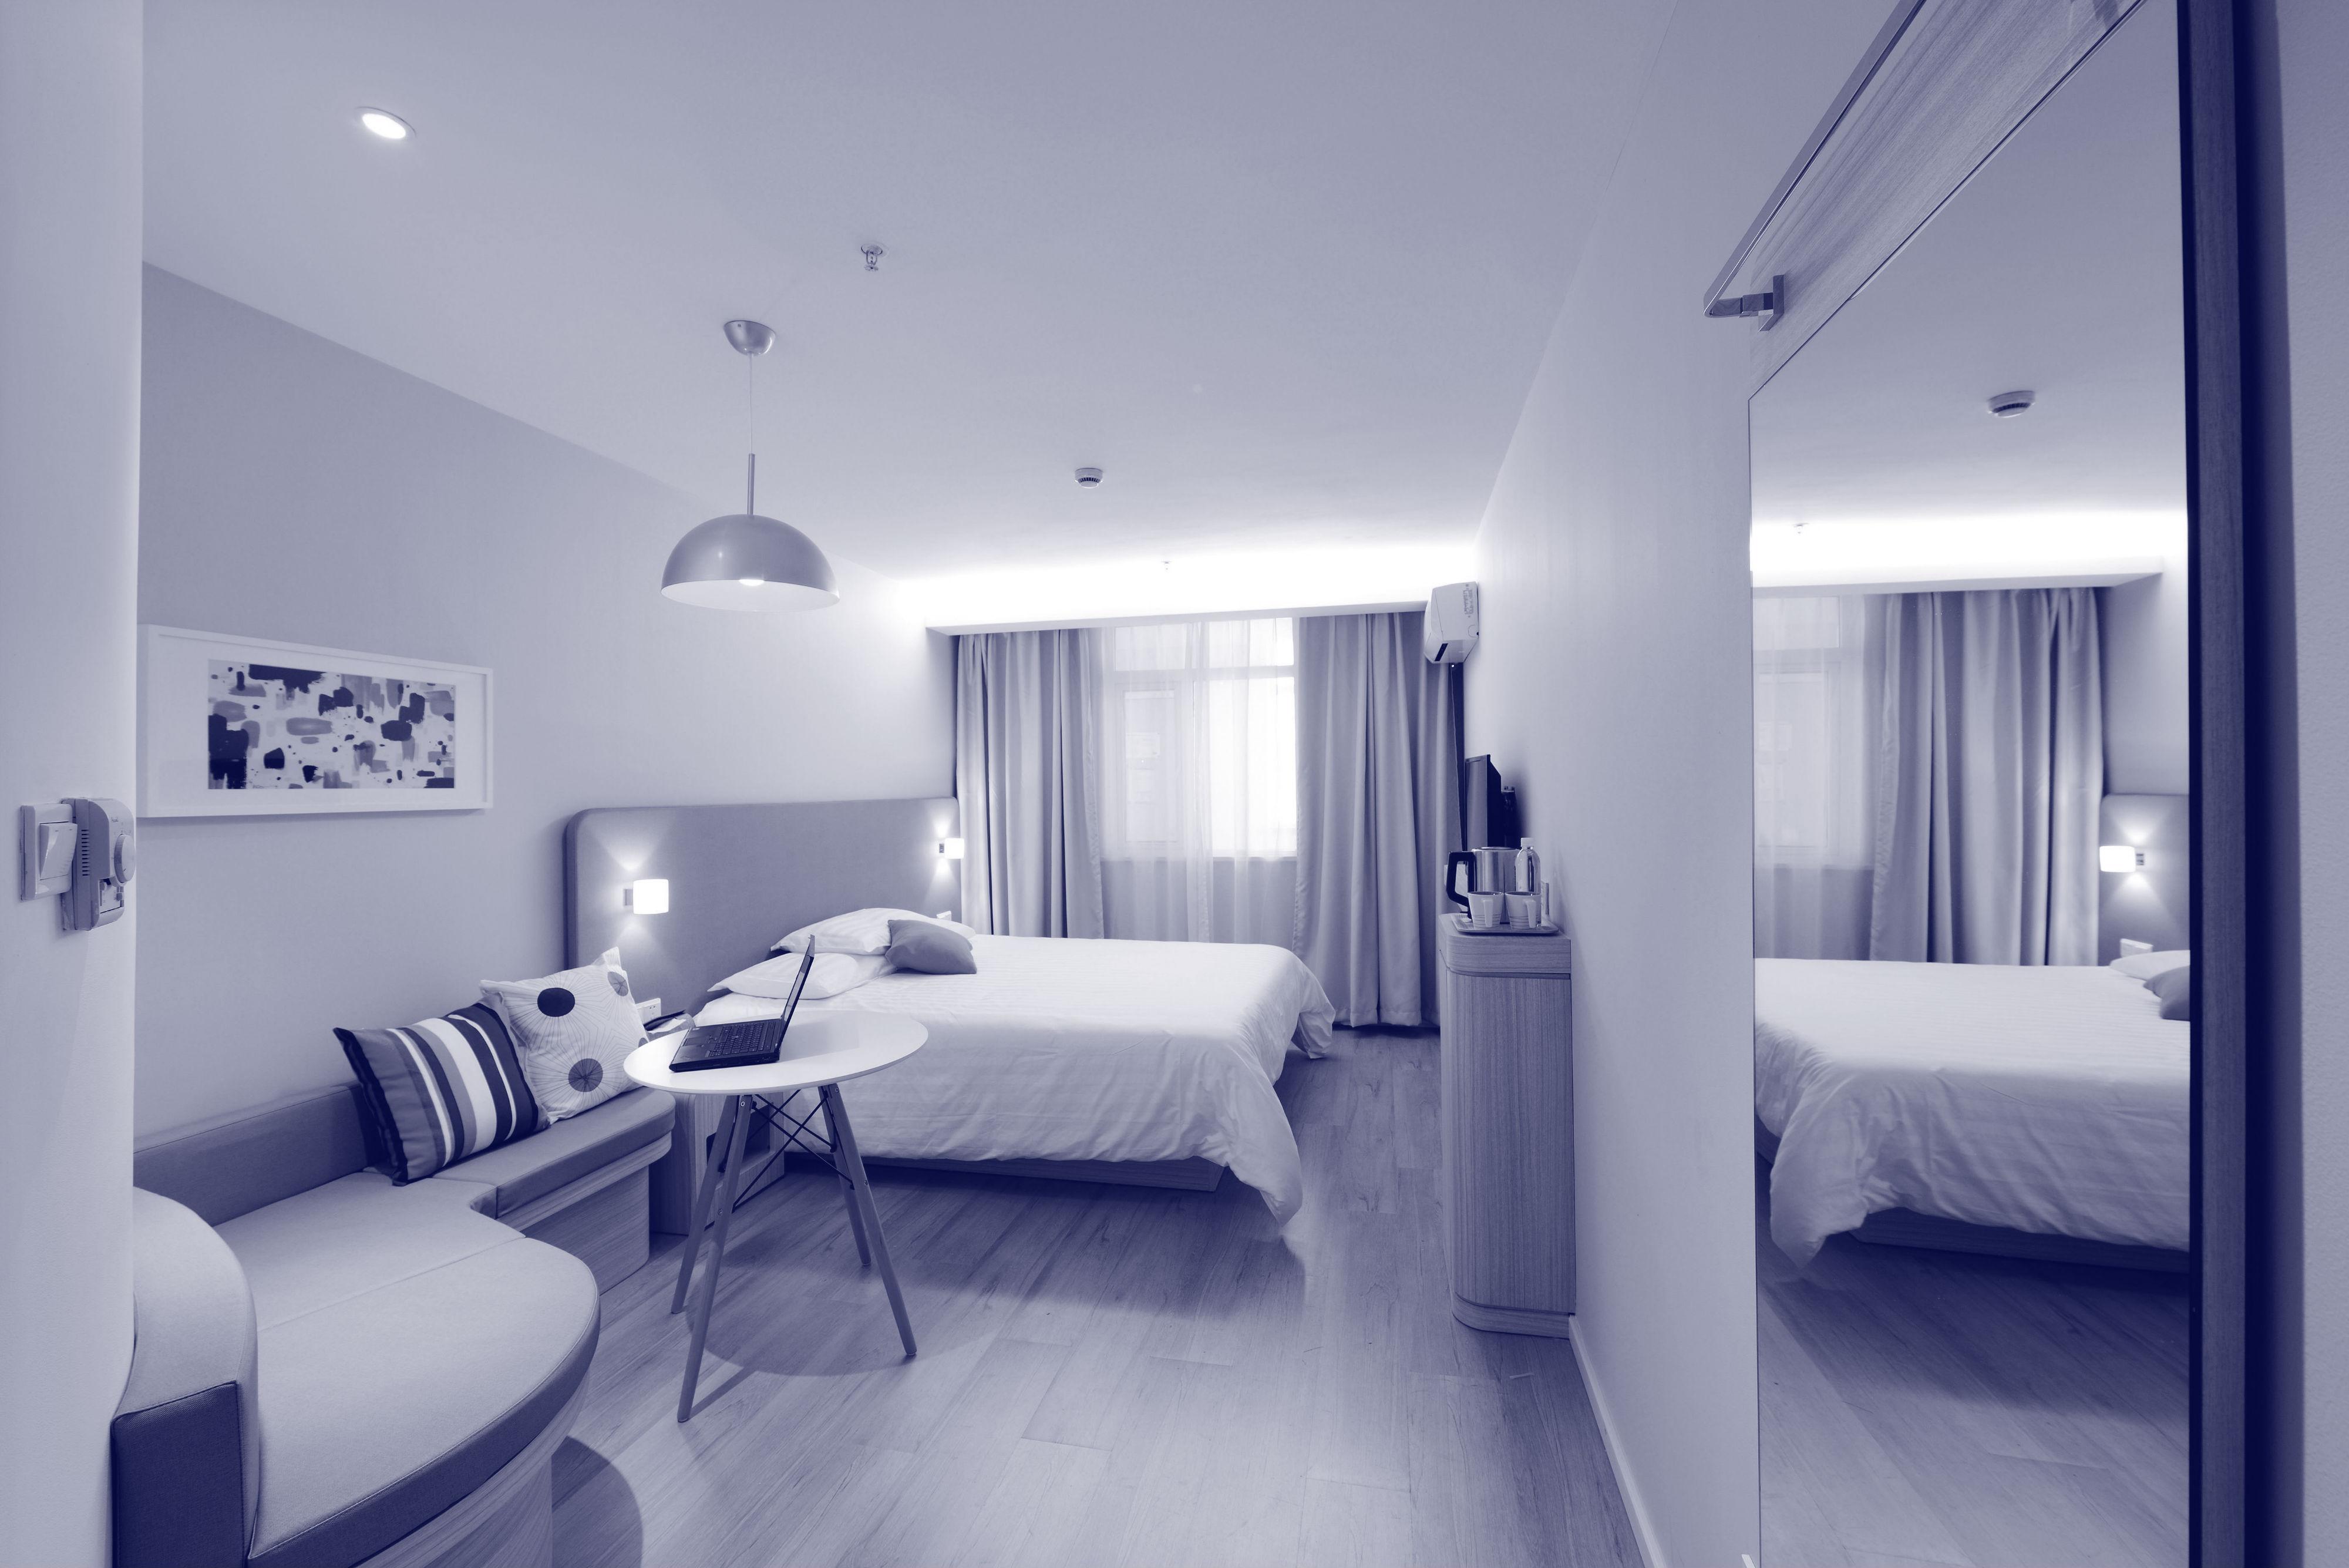 Opvang in hotel